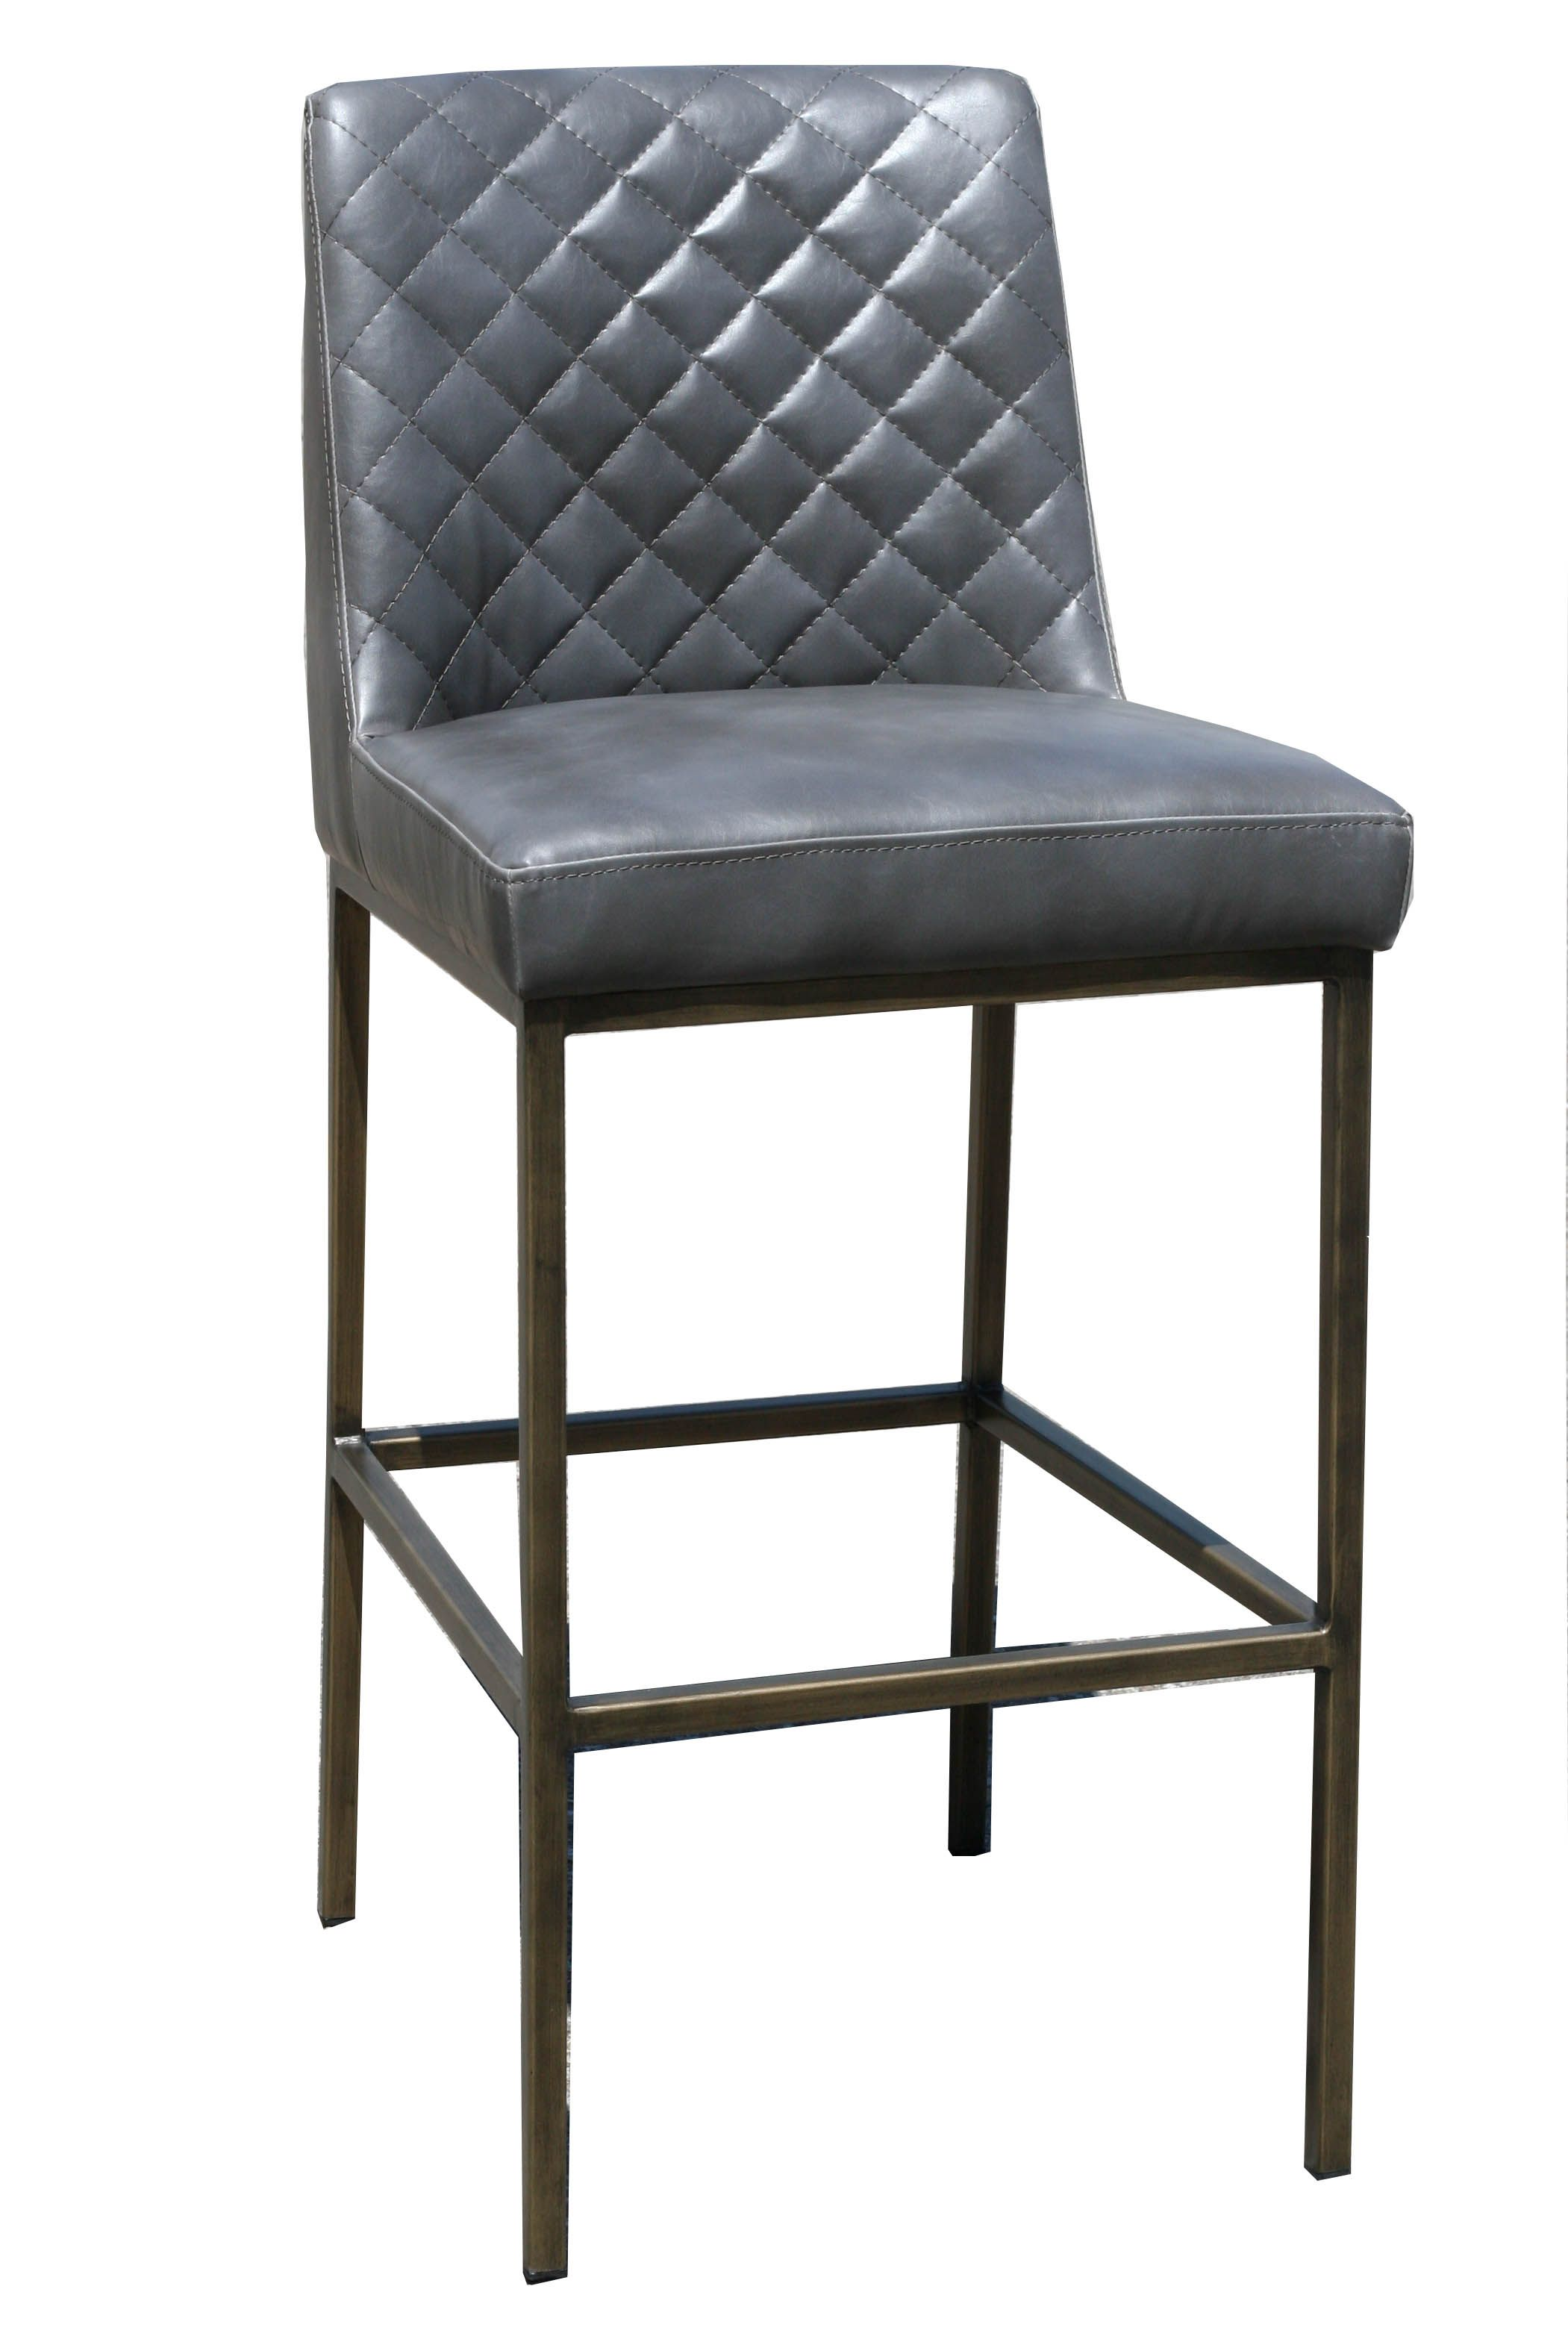 Amazing Grey Leather Counter Stool With Bronze Steel Frame R 1370 Creativecarmelina Interior Chair Design Creativecarmelinacom